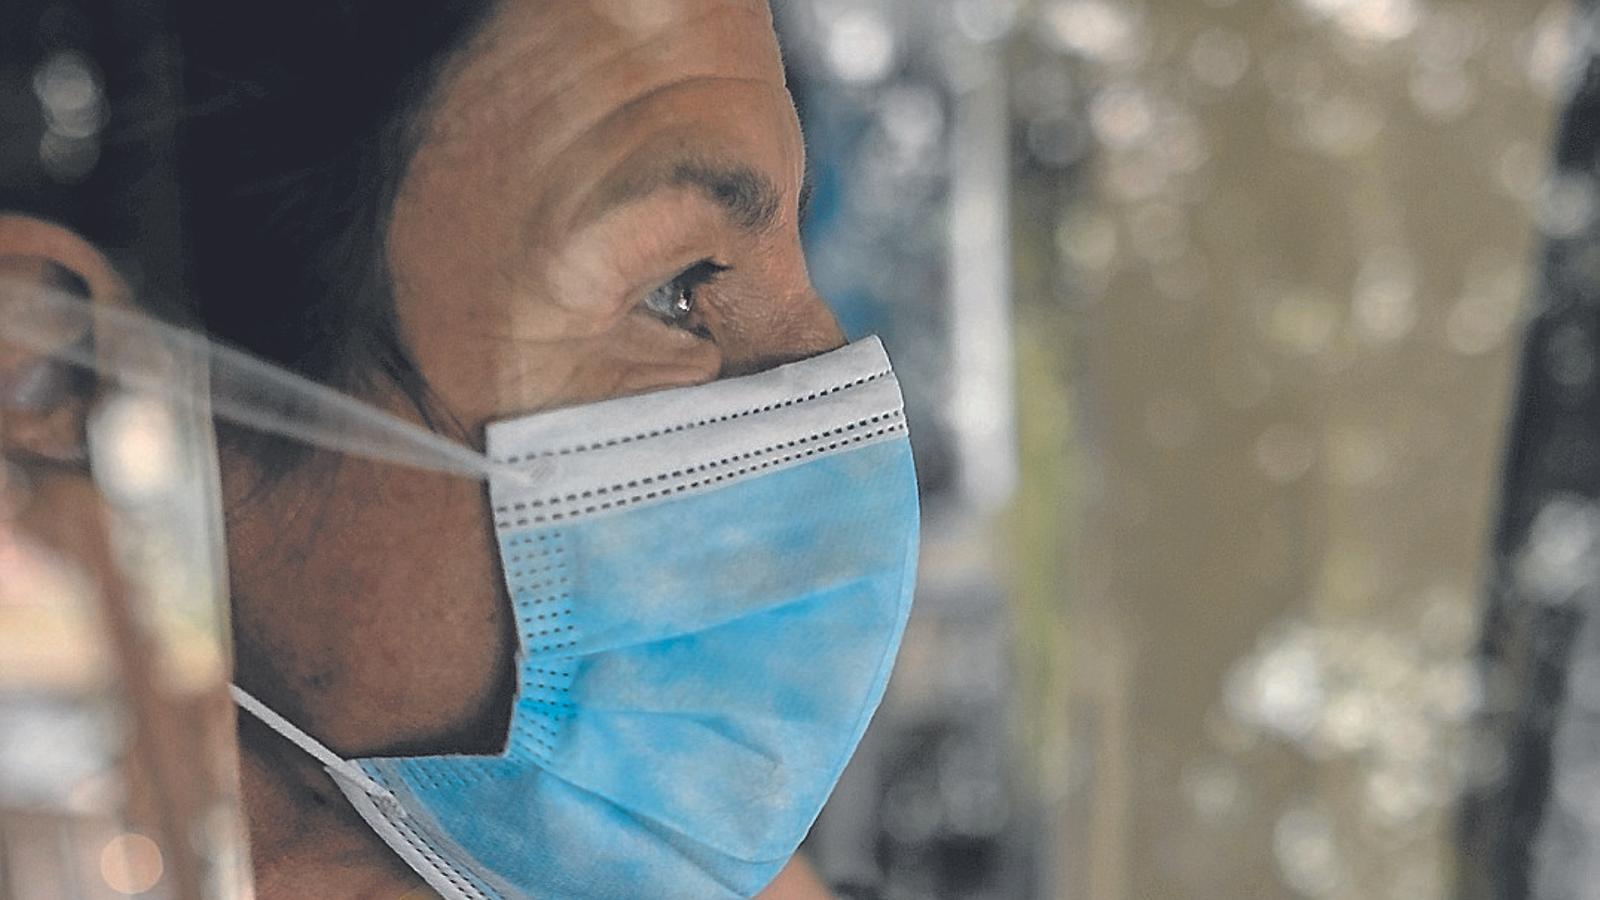 Una dona duu una mascareta quirúrgica a la feina.